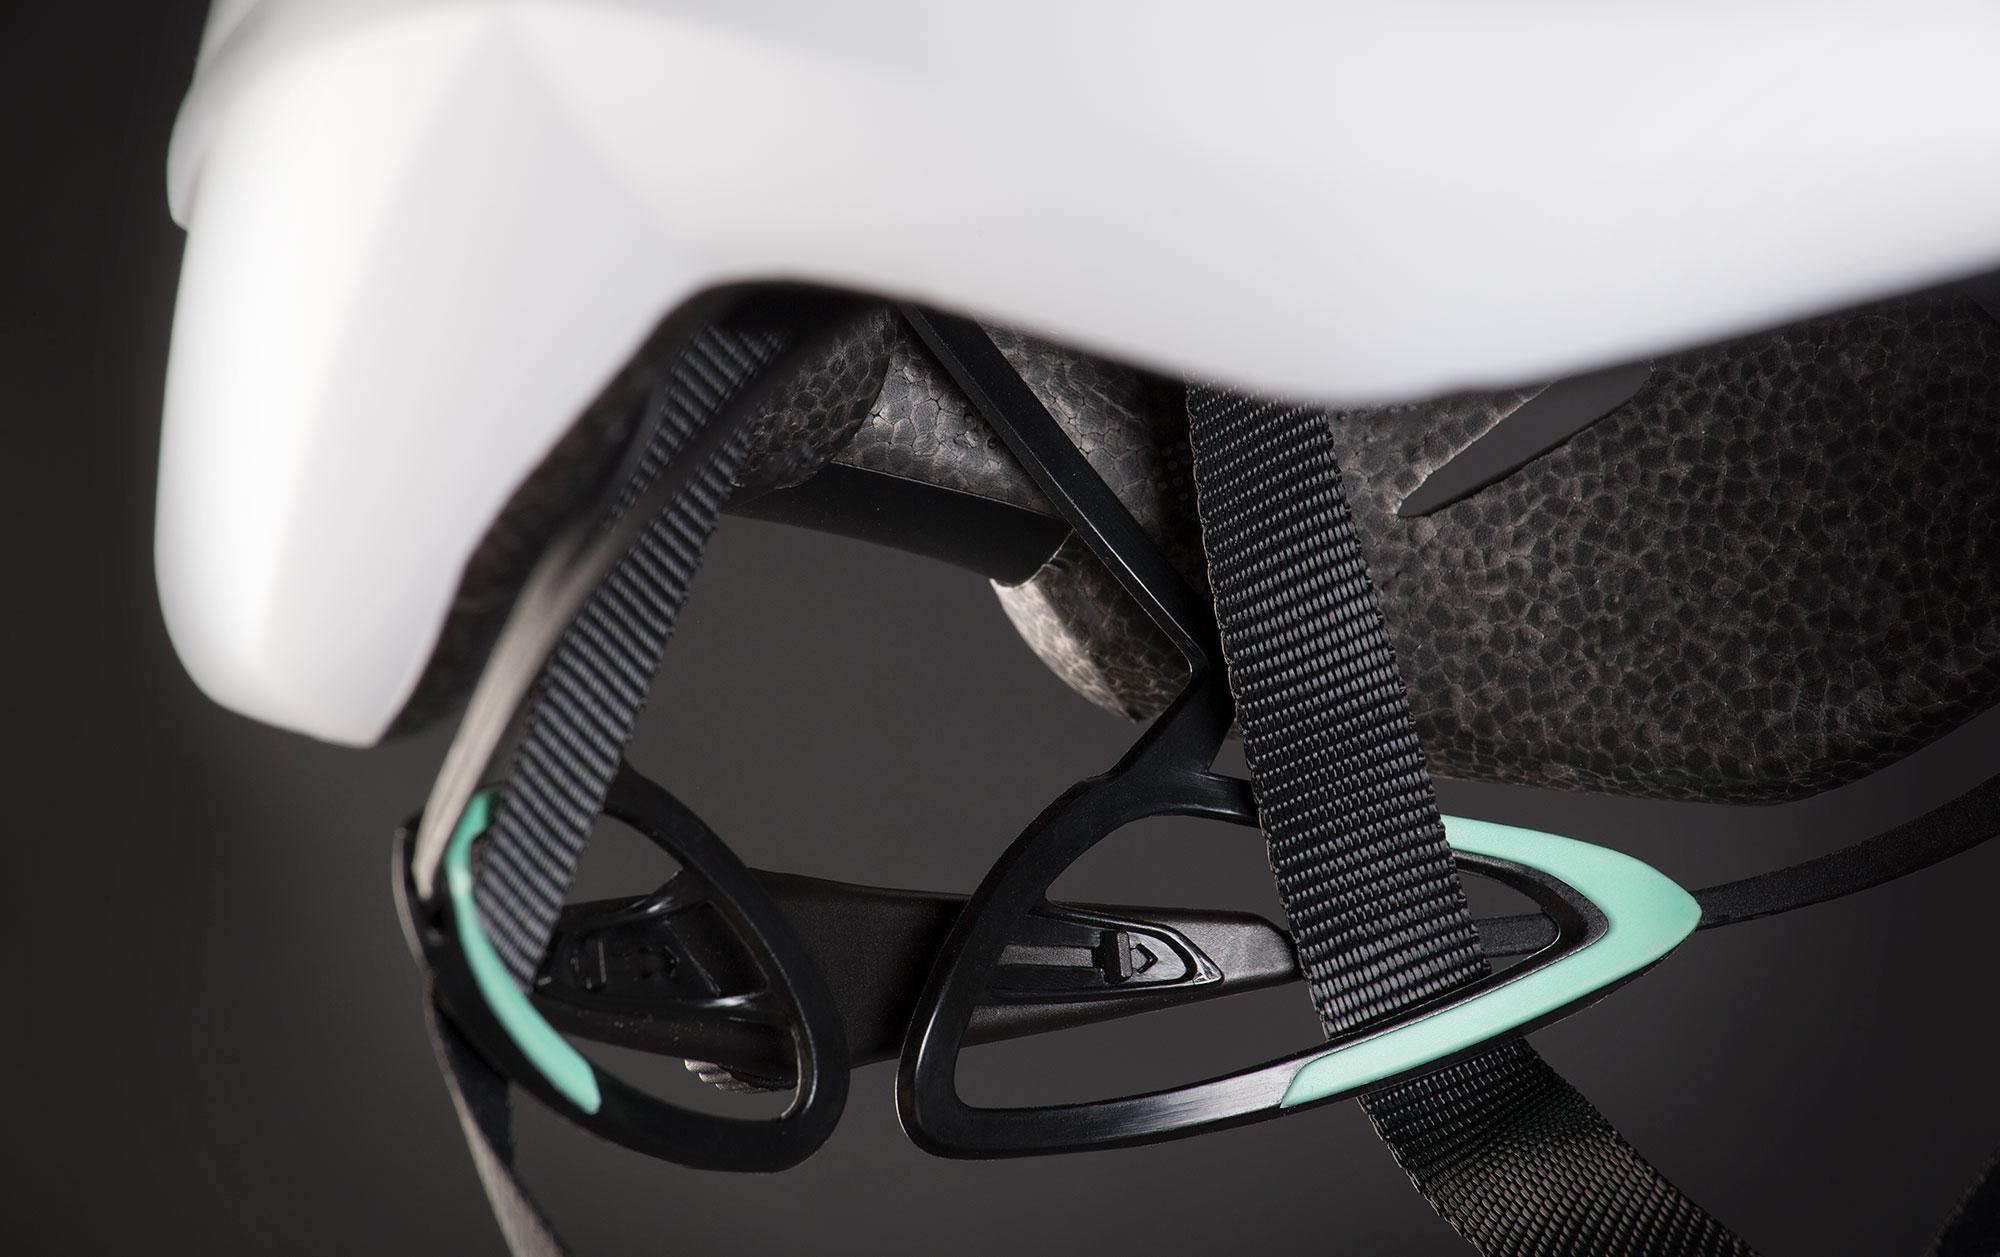 MET Trenta 3K Carbon Road, Aero, Cyclocross and Gravel Helmet retention system